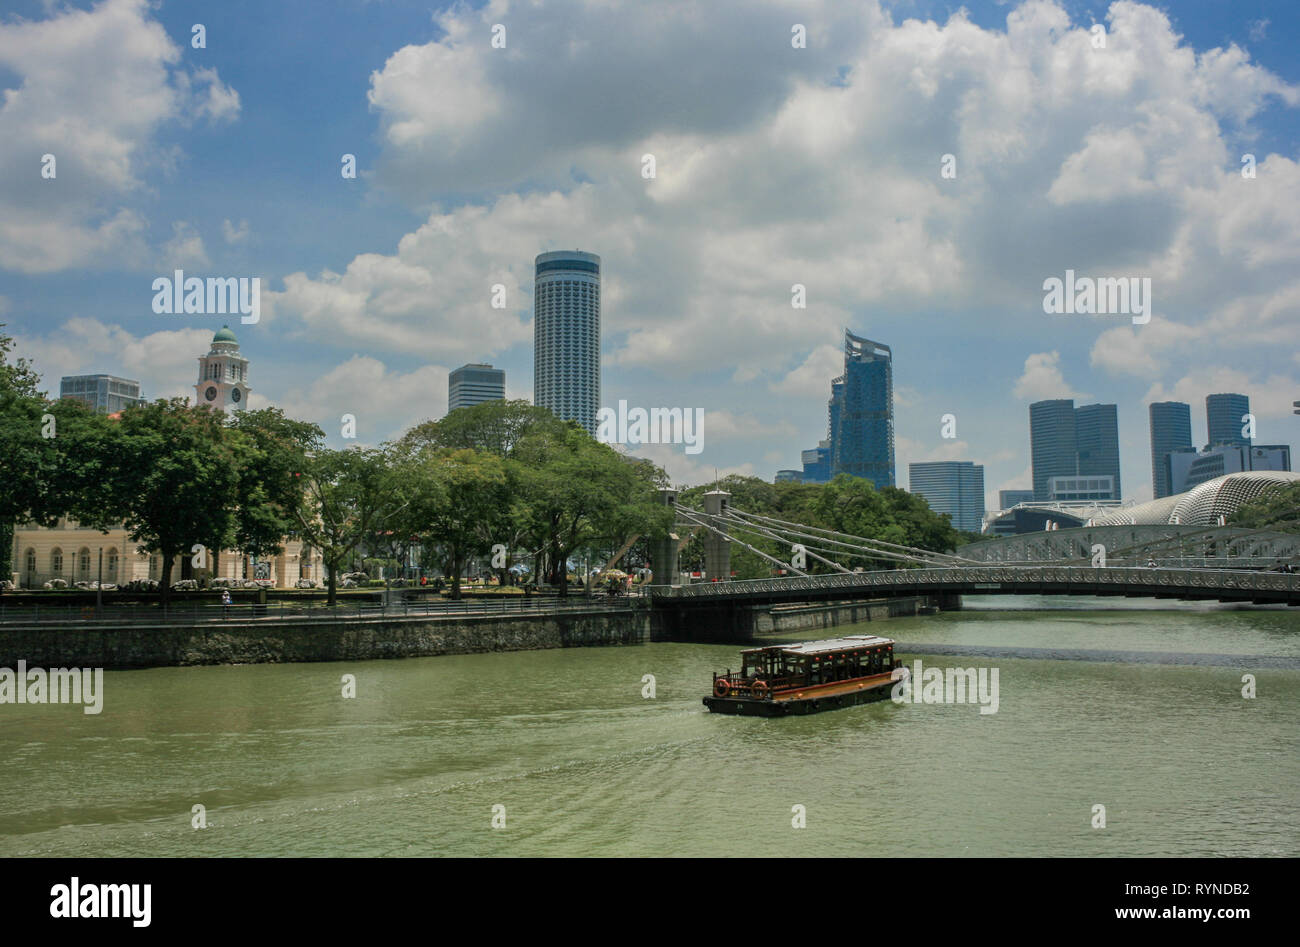 View across the Singapore River towards the Cavenagh Bridge and Victoria Theatre, Singapore - Stock Image